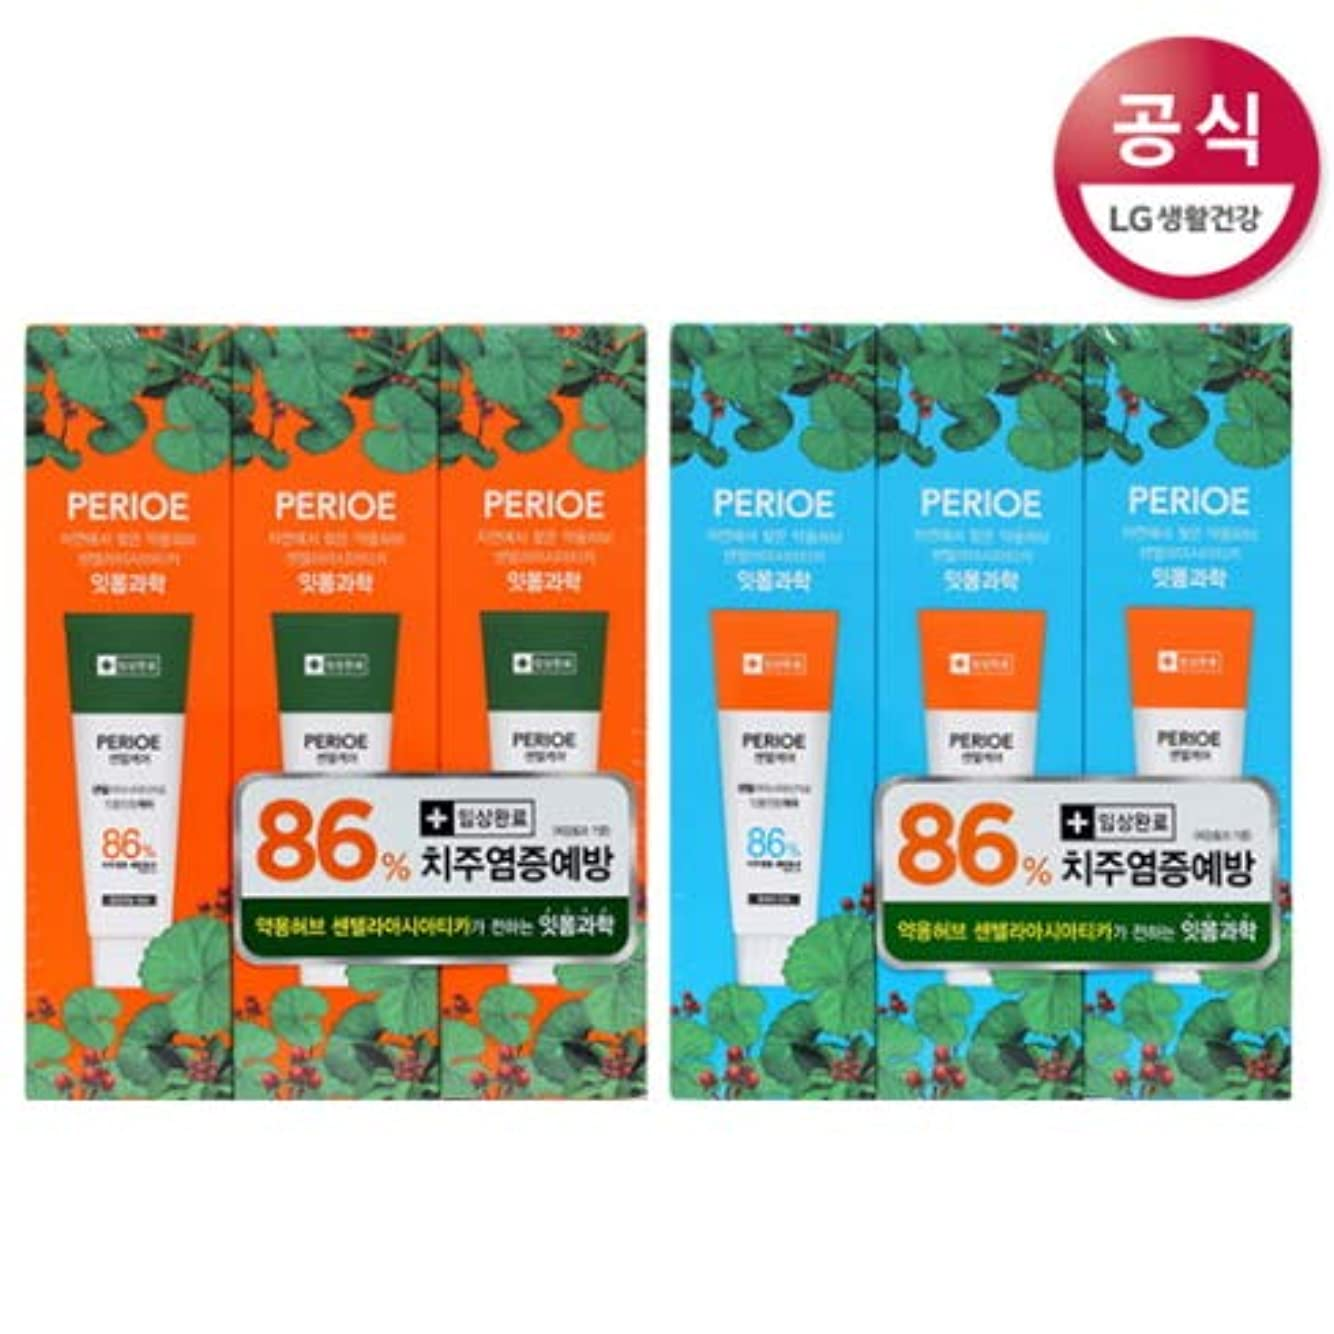 [LG HnB] Perio centel care toothpaste/ペリオセンテルケア歯磨き粉 100gx6個(海外直送品)